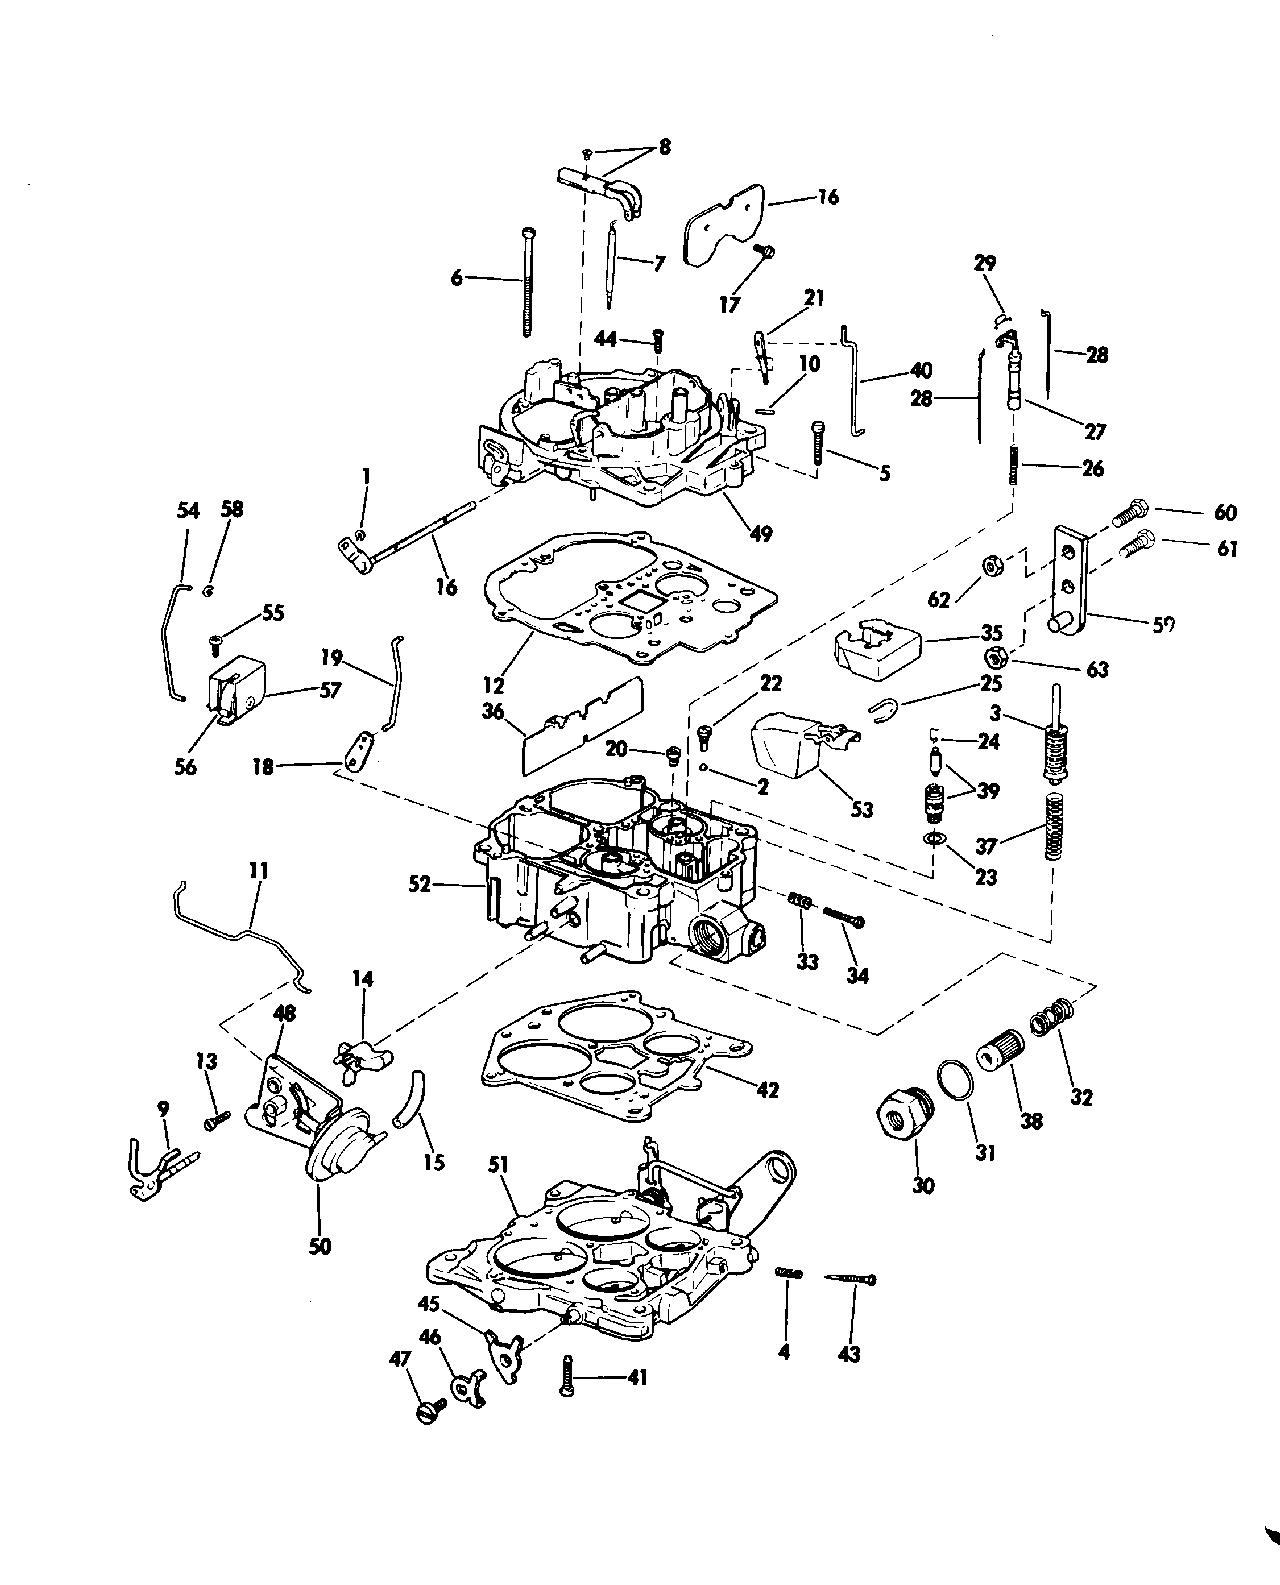 Stern Drive 240 J Carburetor Group 225 Hp Models